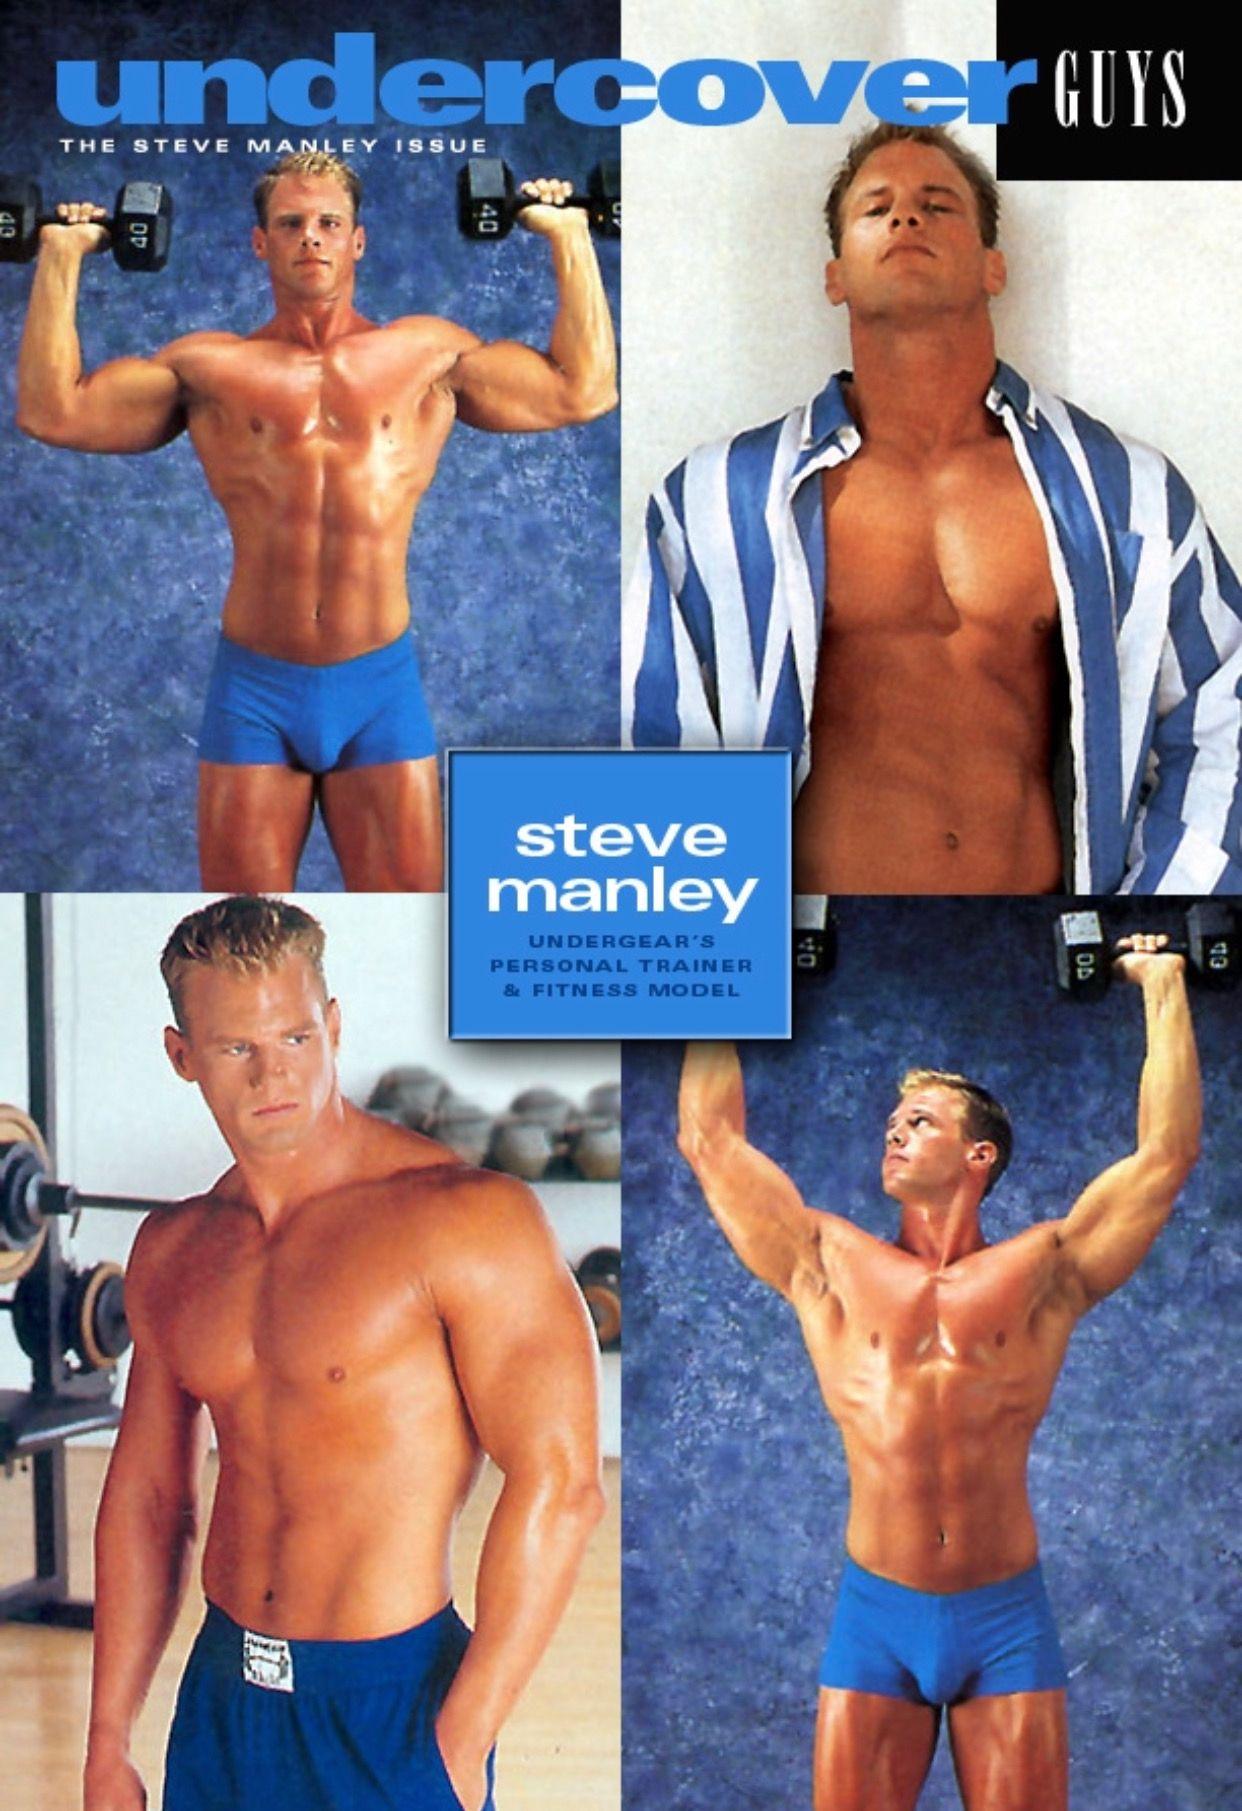 d2cf0826cb Steve Manley | International Male Catalog Models ---- RAH in 2019 | Male  models, Swimwear, Fashion